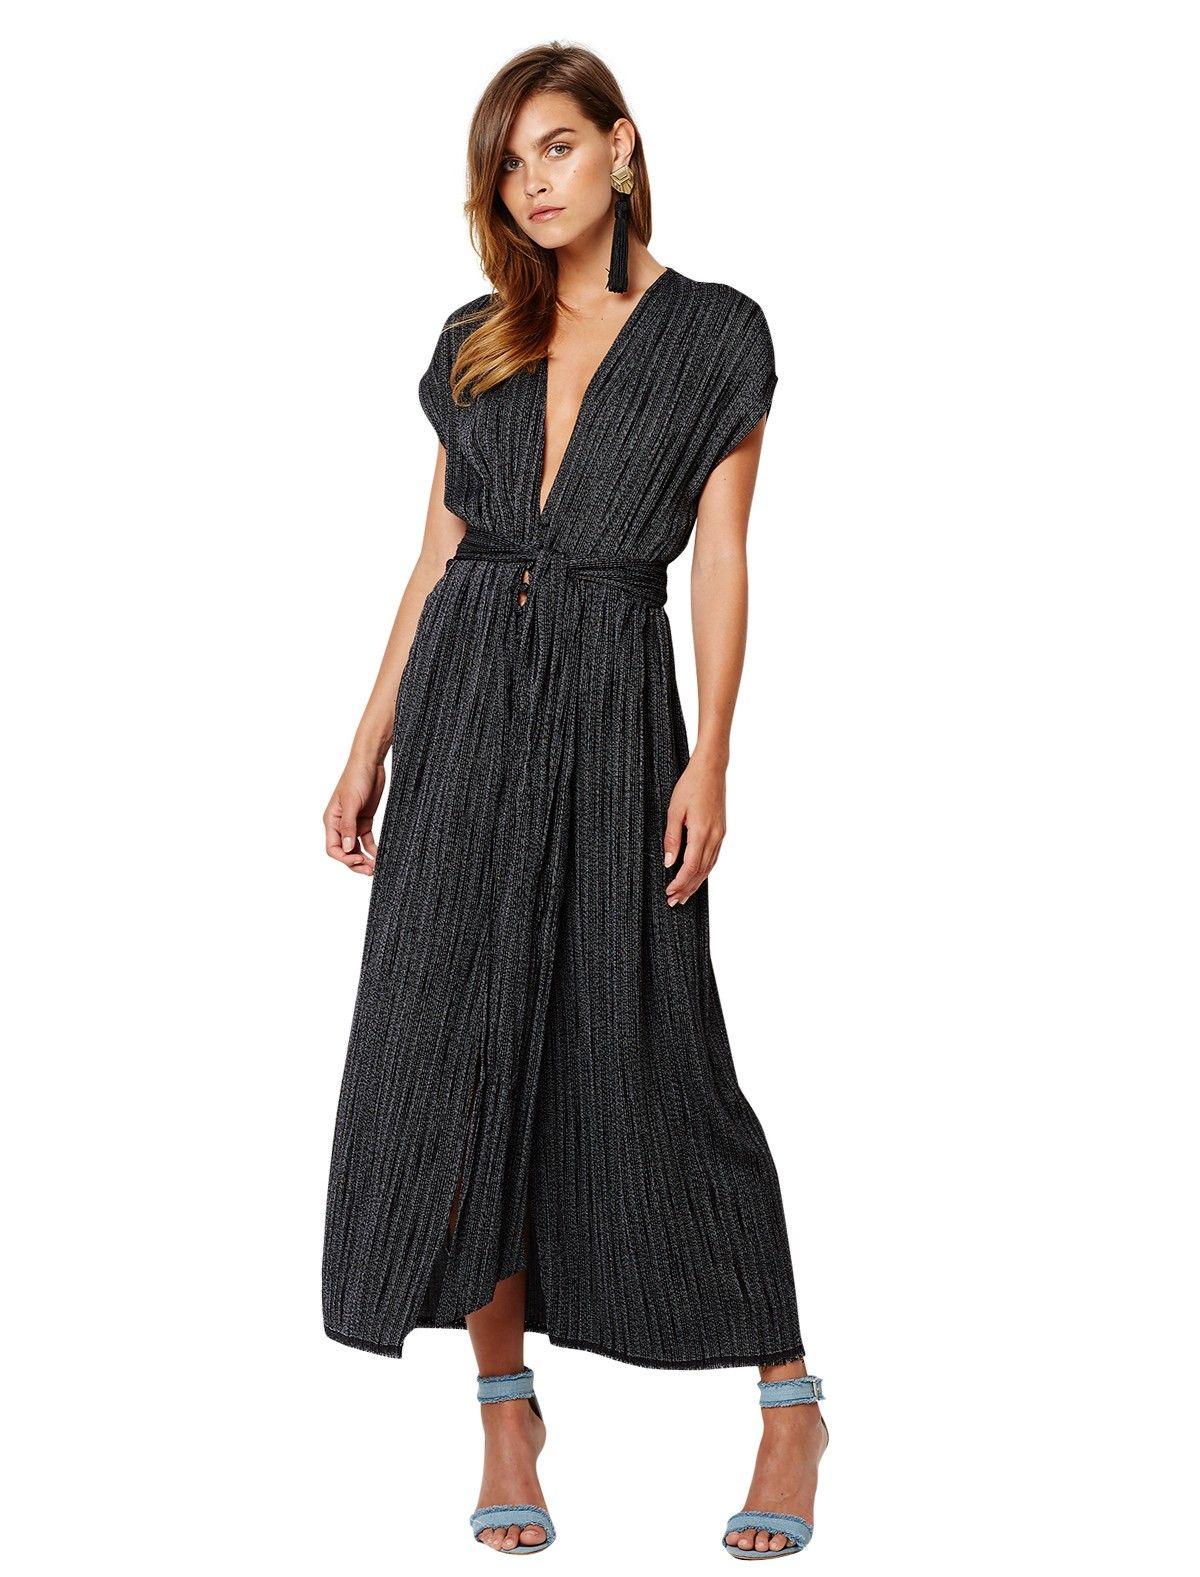 44f95daa12 bec and bridge - Blackbird Dress